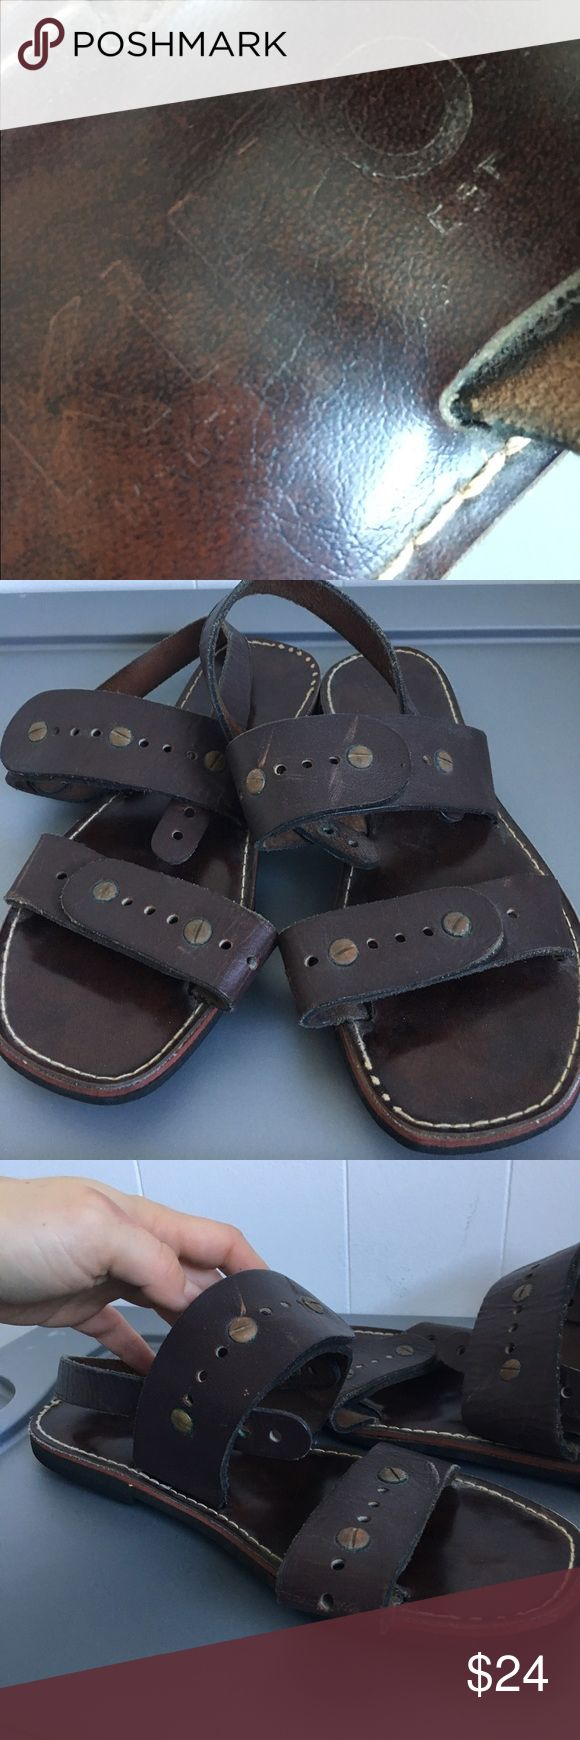 Vintage Kino leather Jesus Sandals Trashed Sold as is❗️no returns Kino Shoes Sandals & Flip-Flops